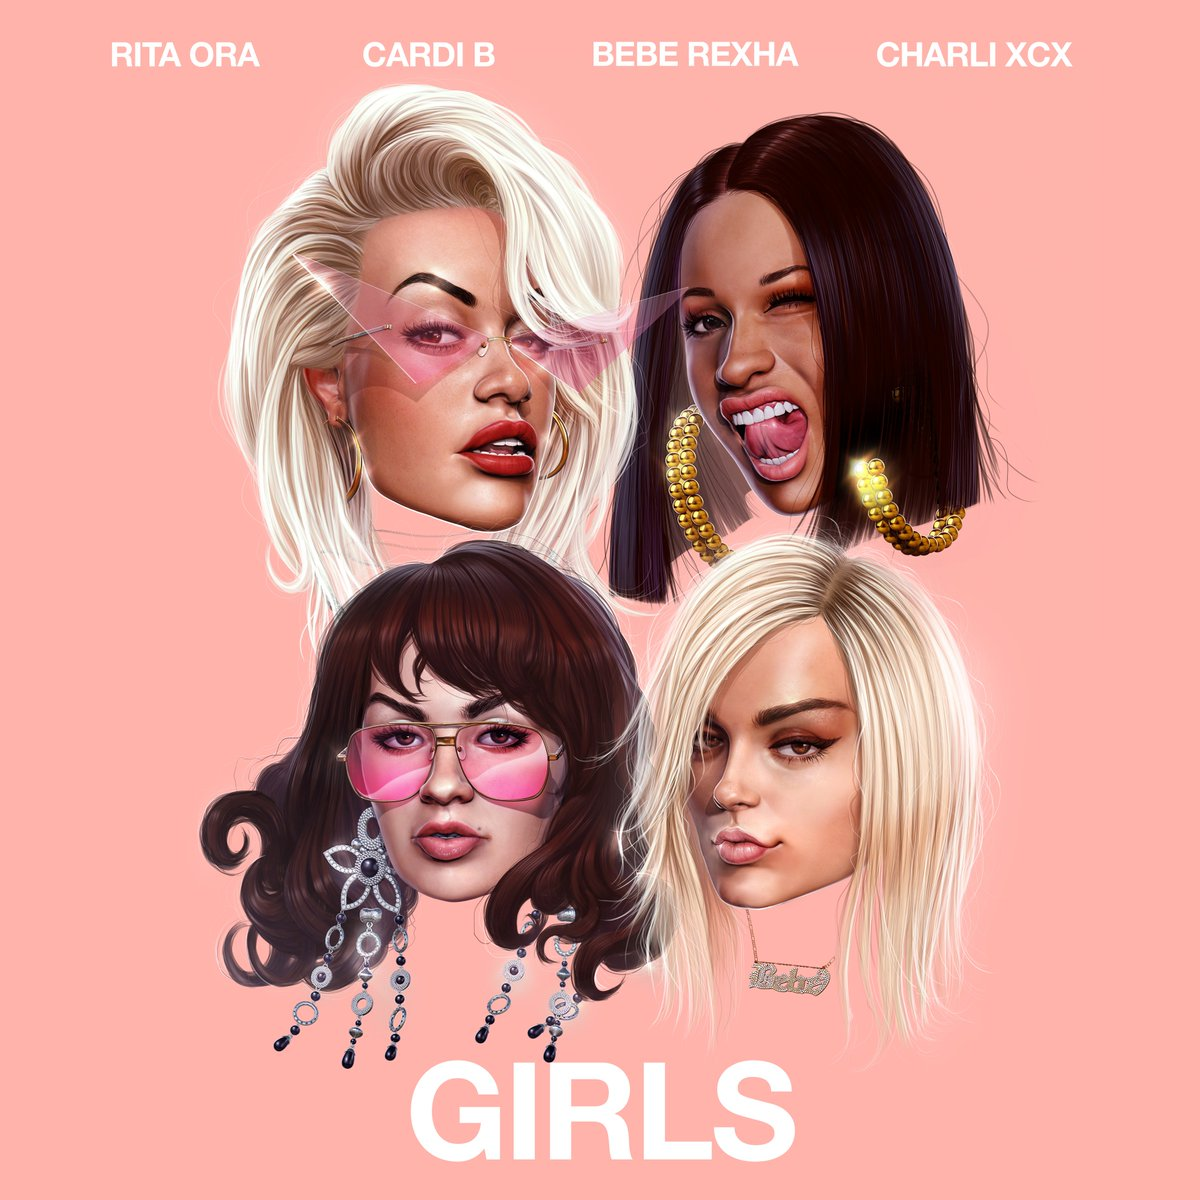 GIRLS – COMING FRIDAY 💕 @iamcardib @BebeRexha @charli_xcx